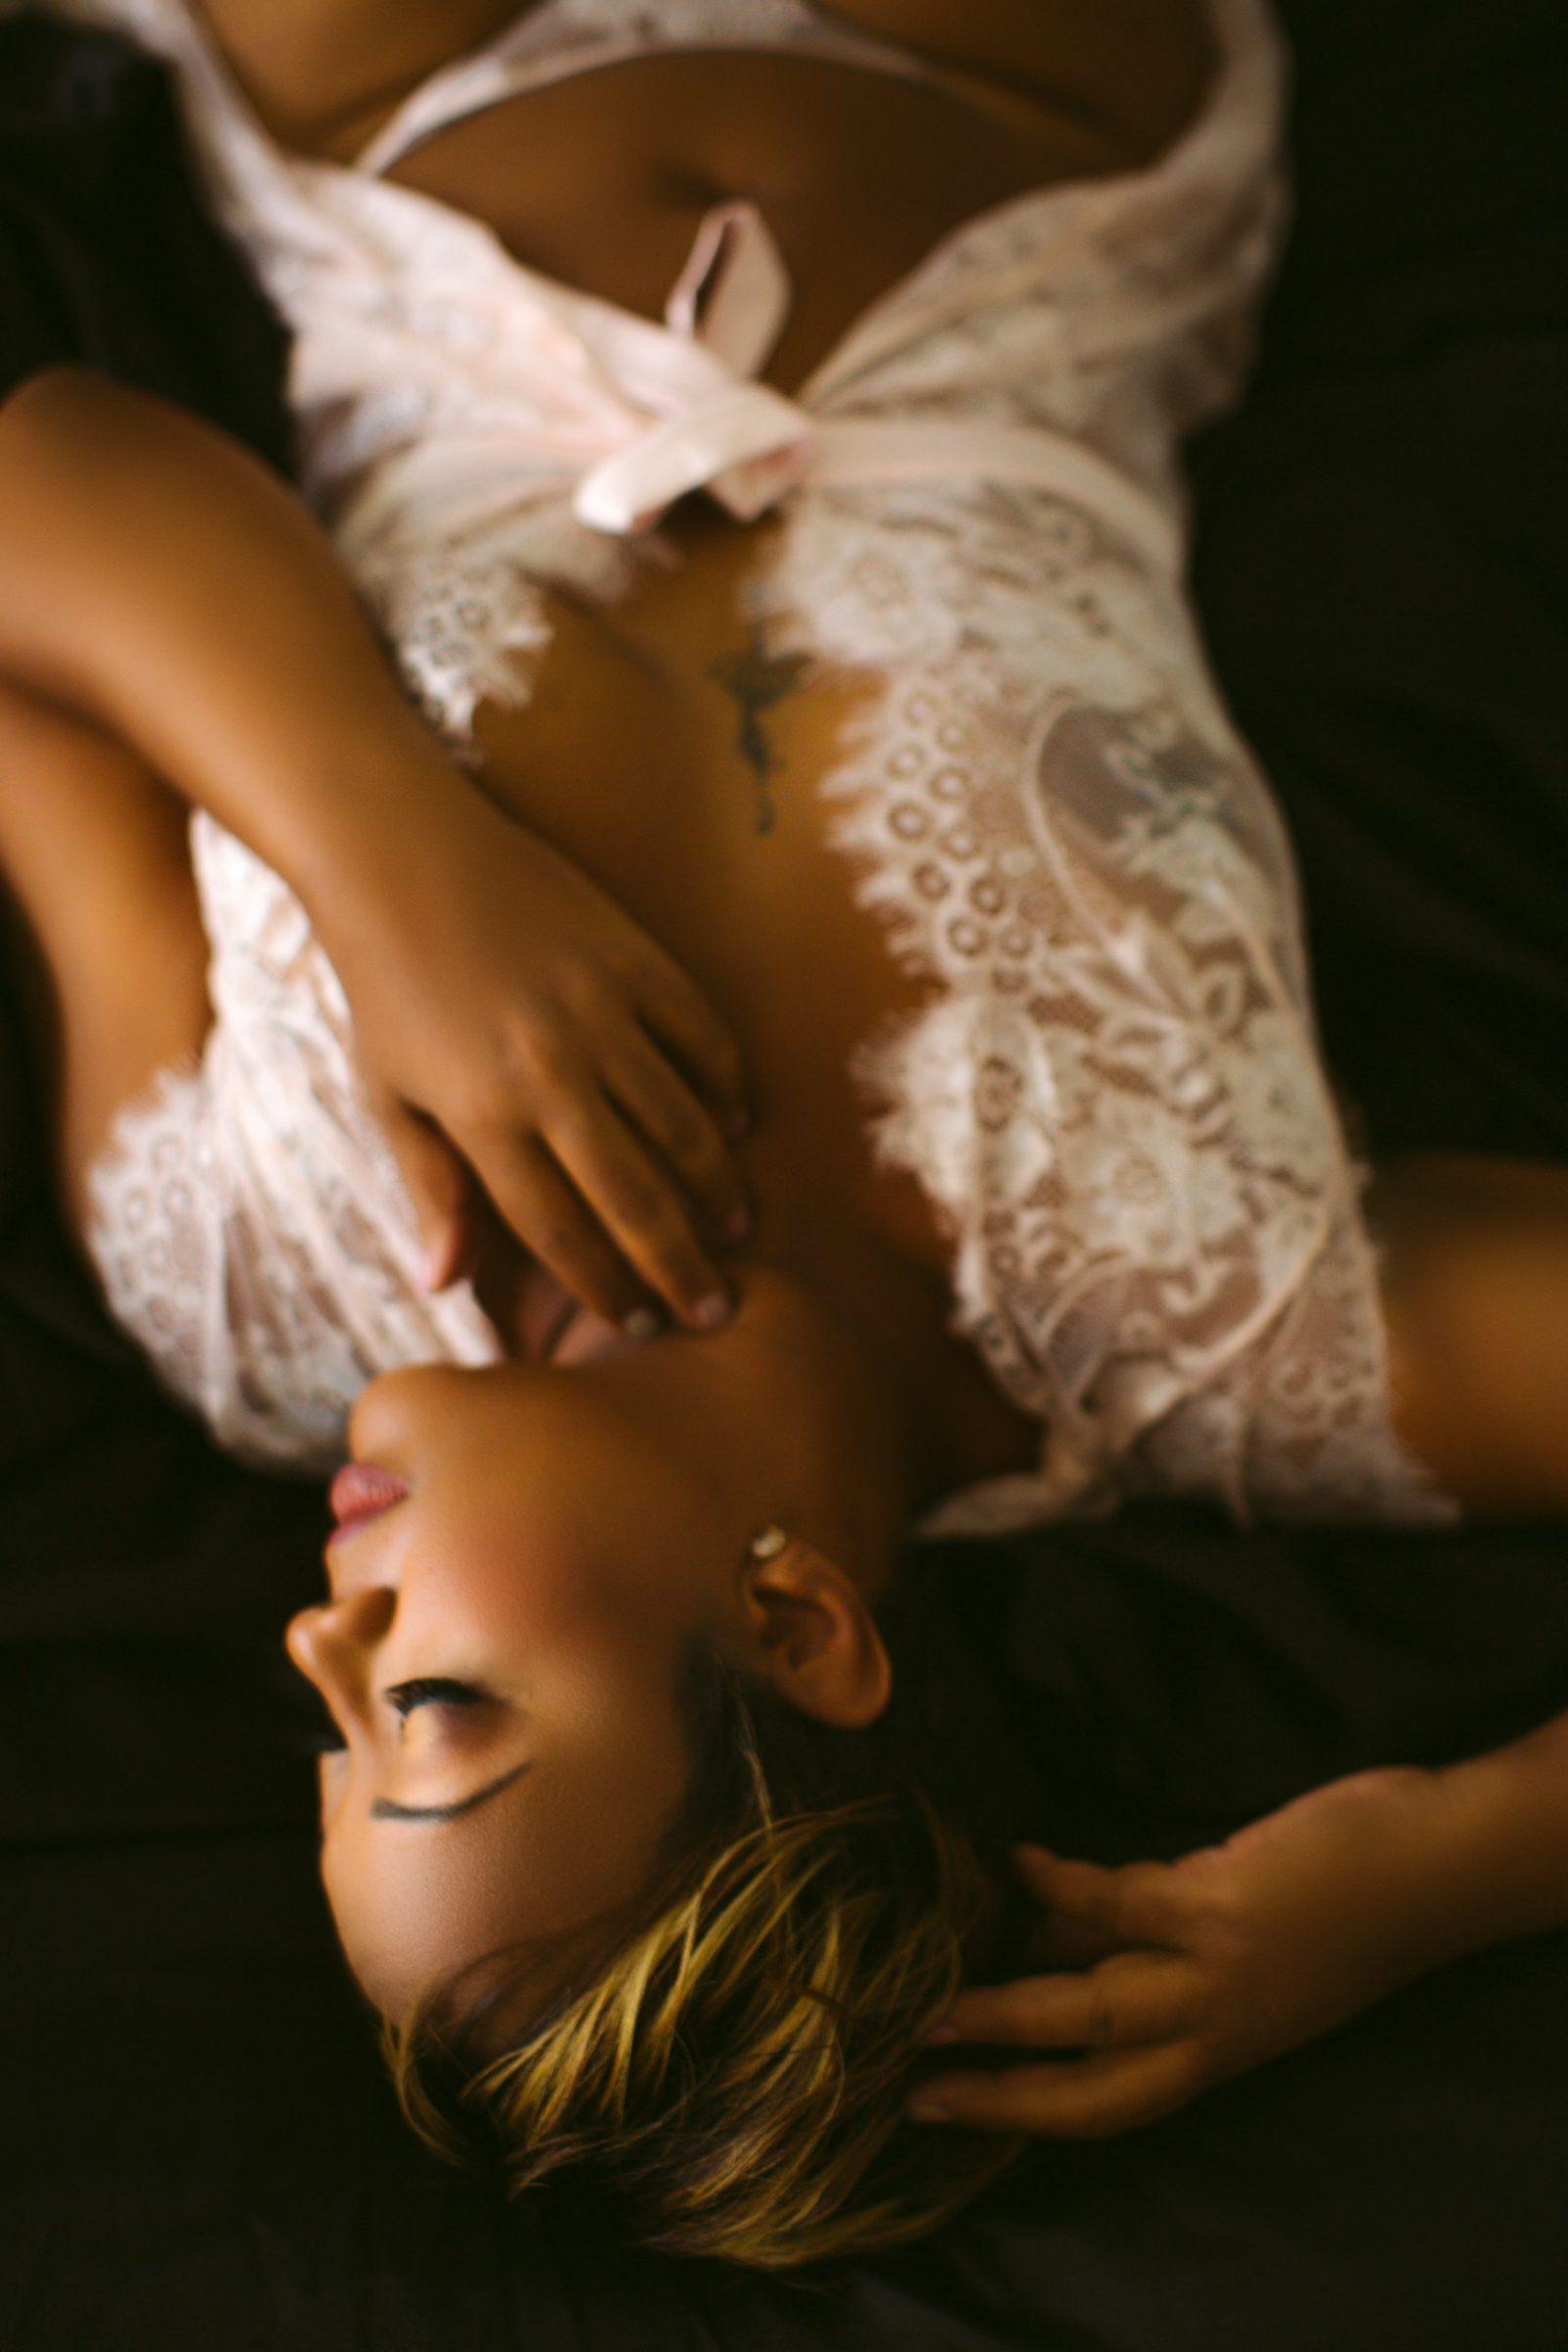 miami brickell boudoir